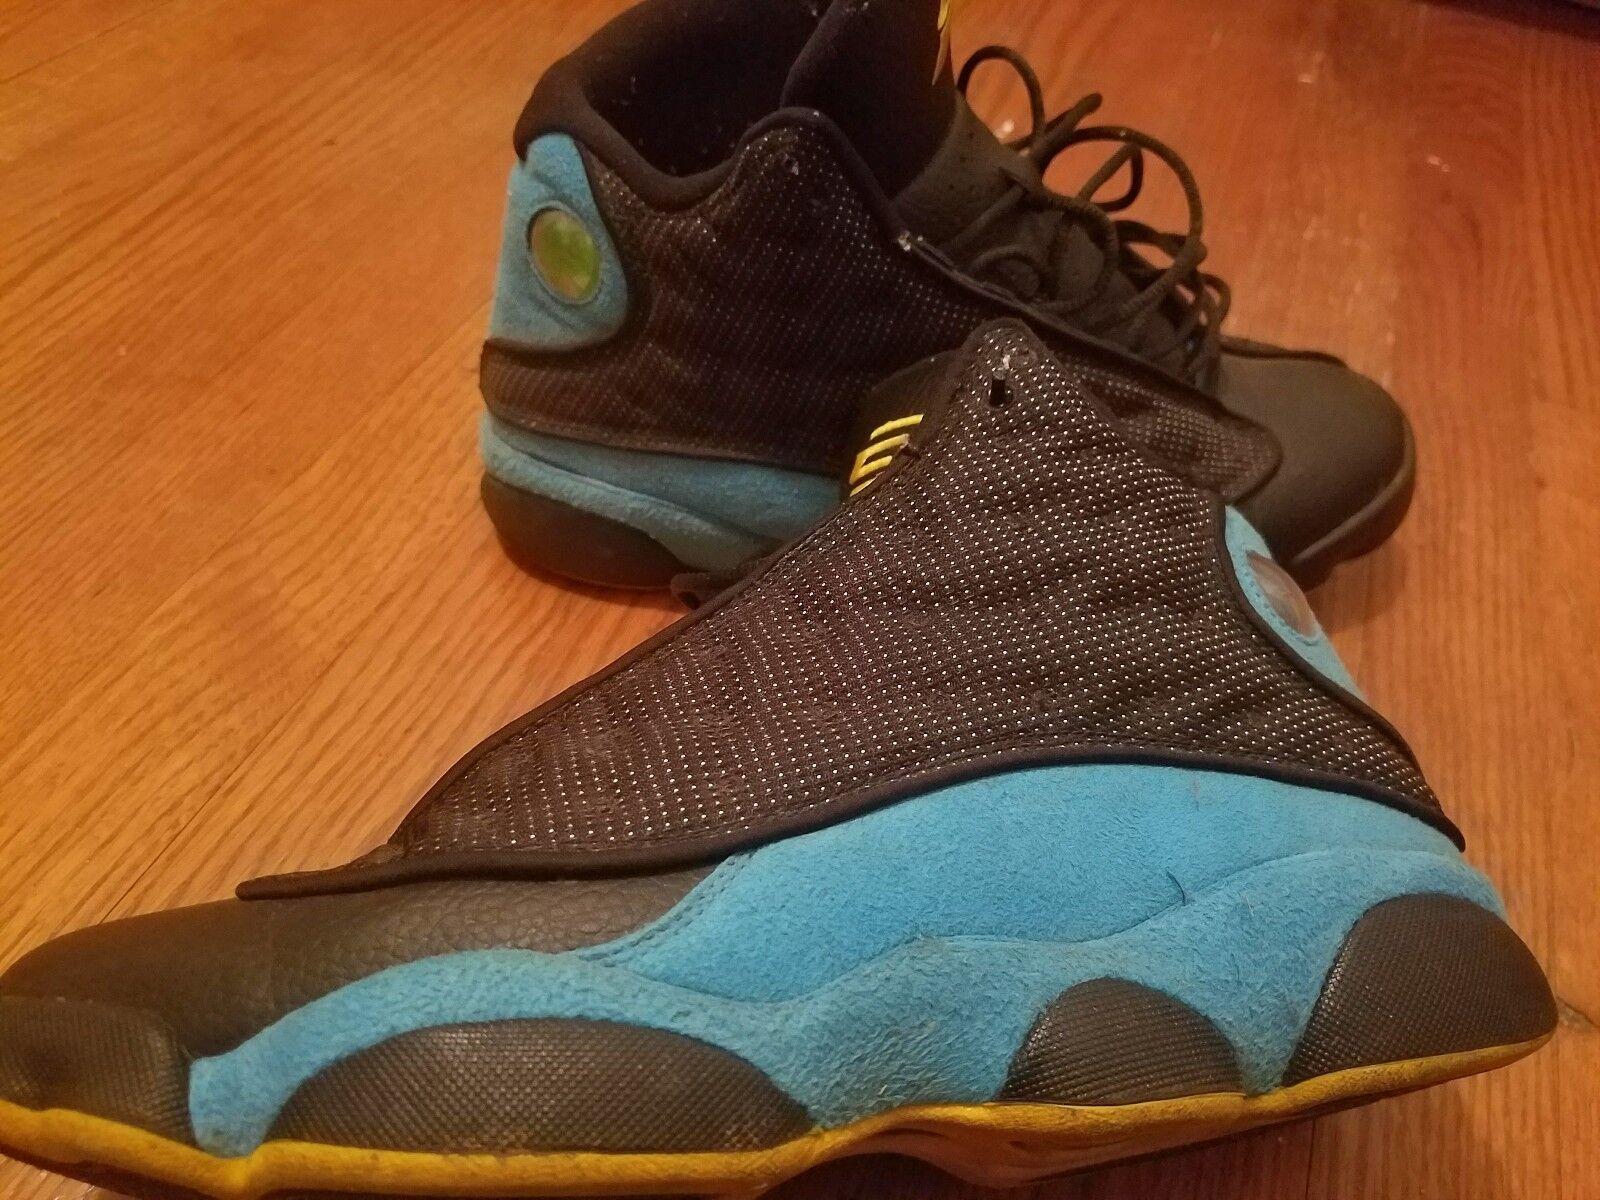 Nike air blu jordan xiii 13 vintage nero blu air 11 cp3 11 blu b9b003   4f7355